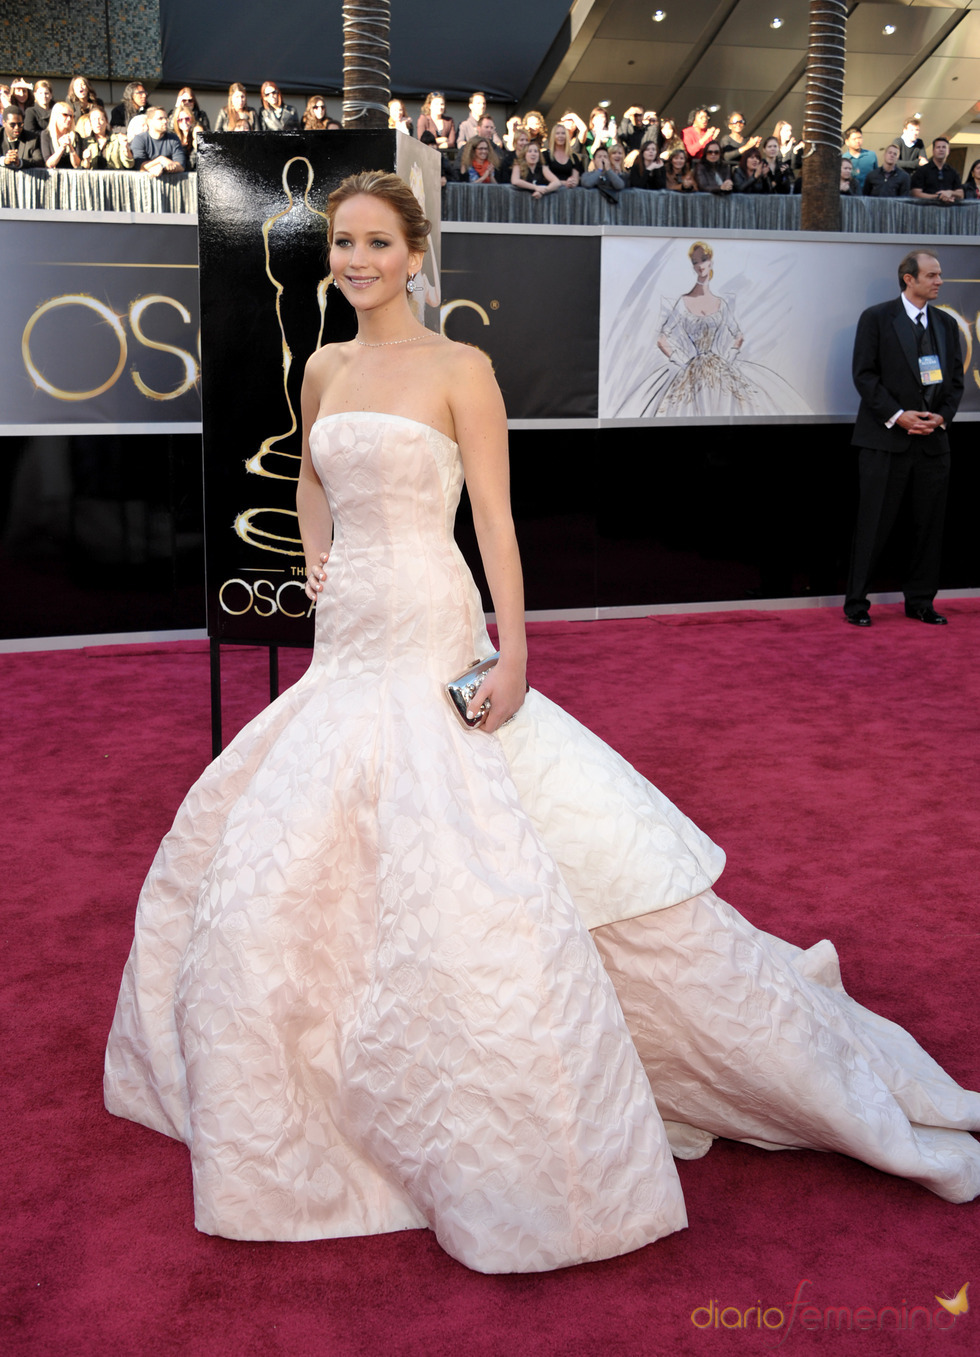 Jennifer Lawrence en la alfombra roja de los Oscars 2013